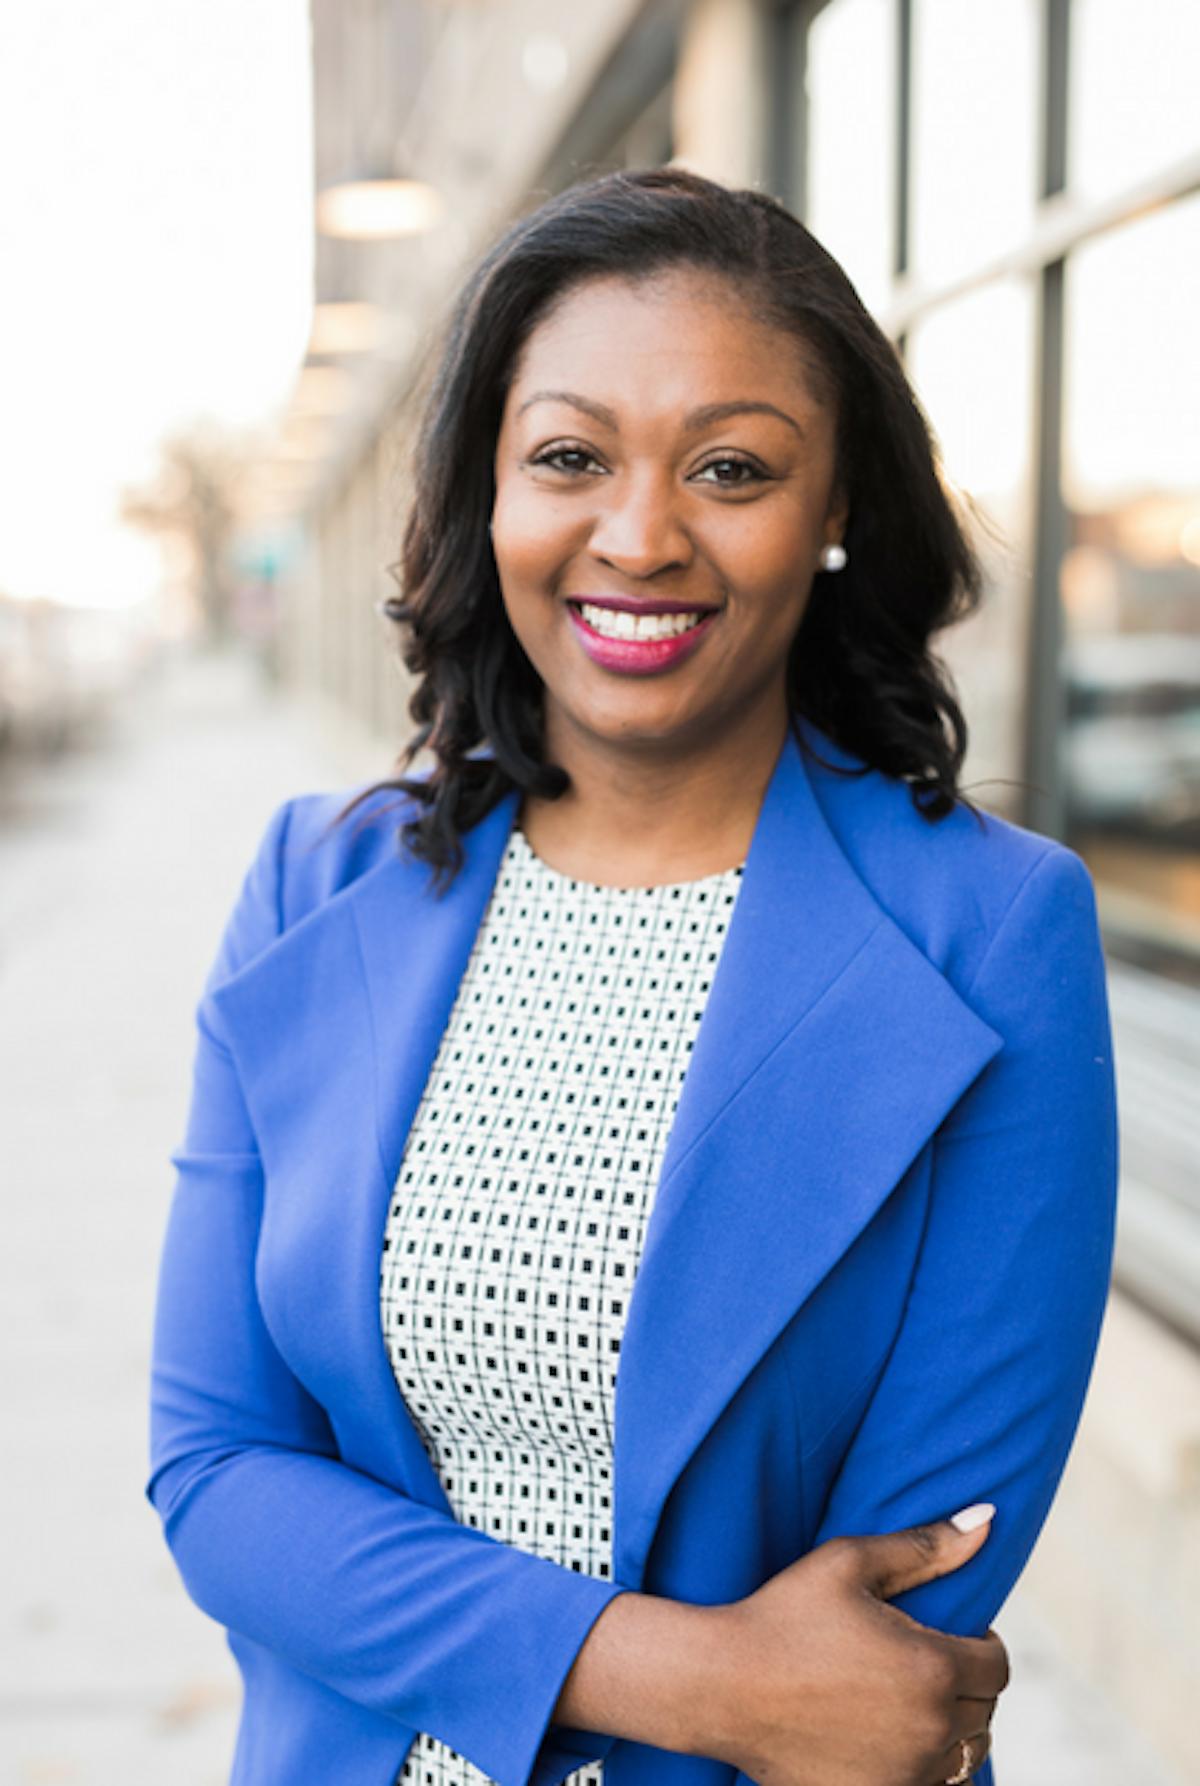 Sarah Anthony, Willoughby Avenue, The Five Fifths, KOLUMN Magazine, KOLUMN, African American Politics, Black in Politics